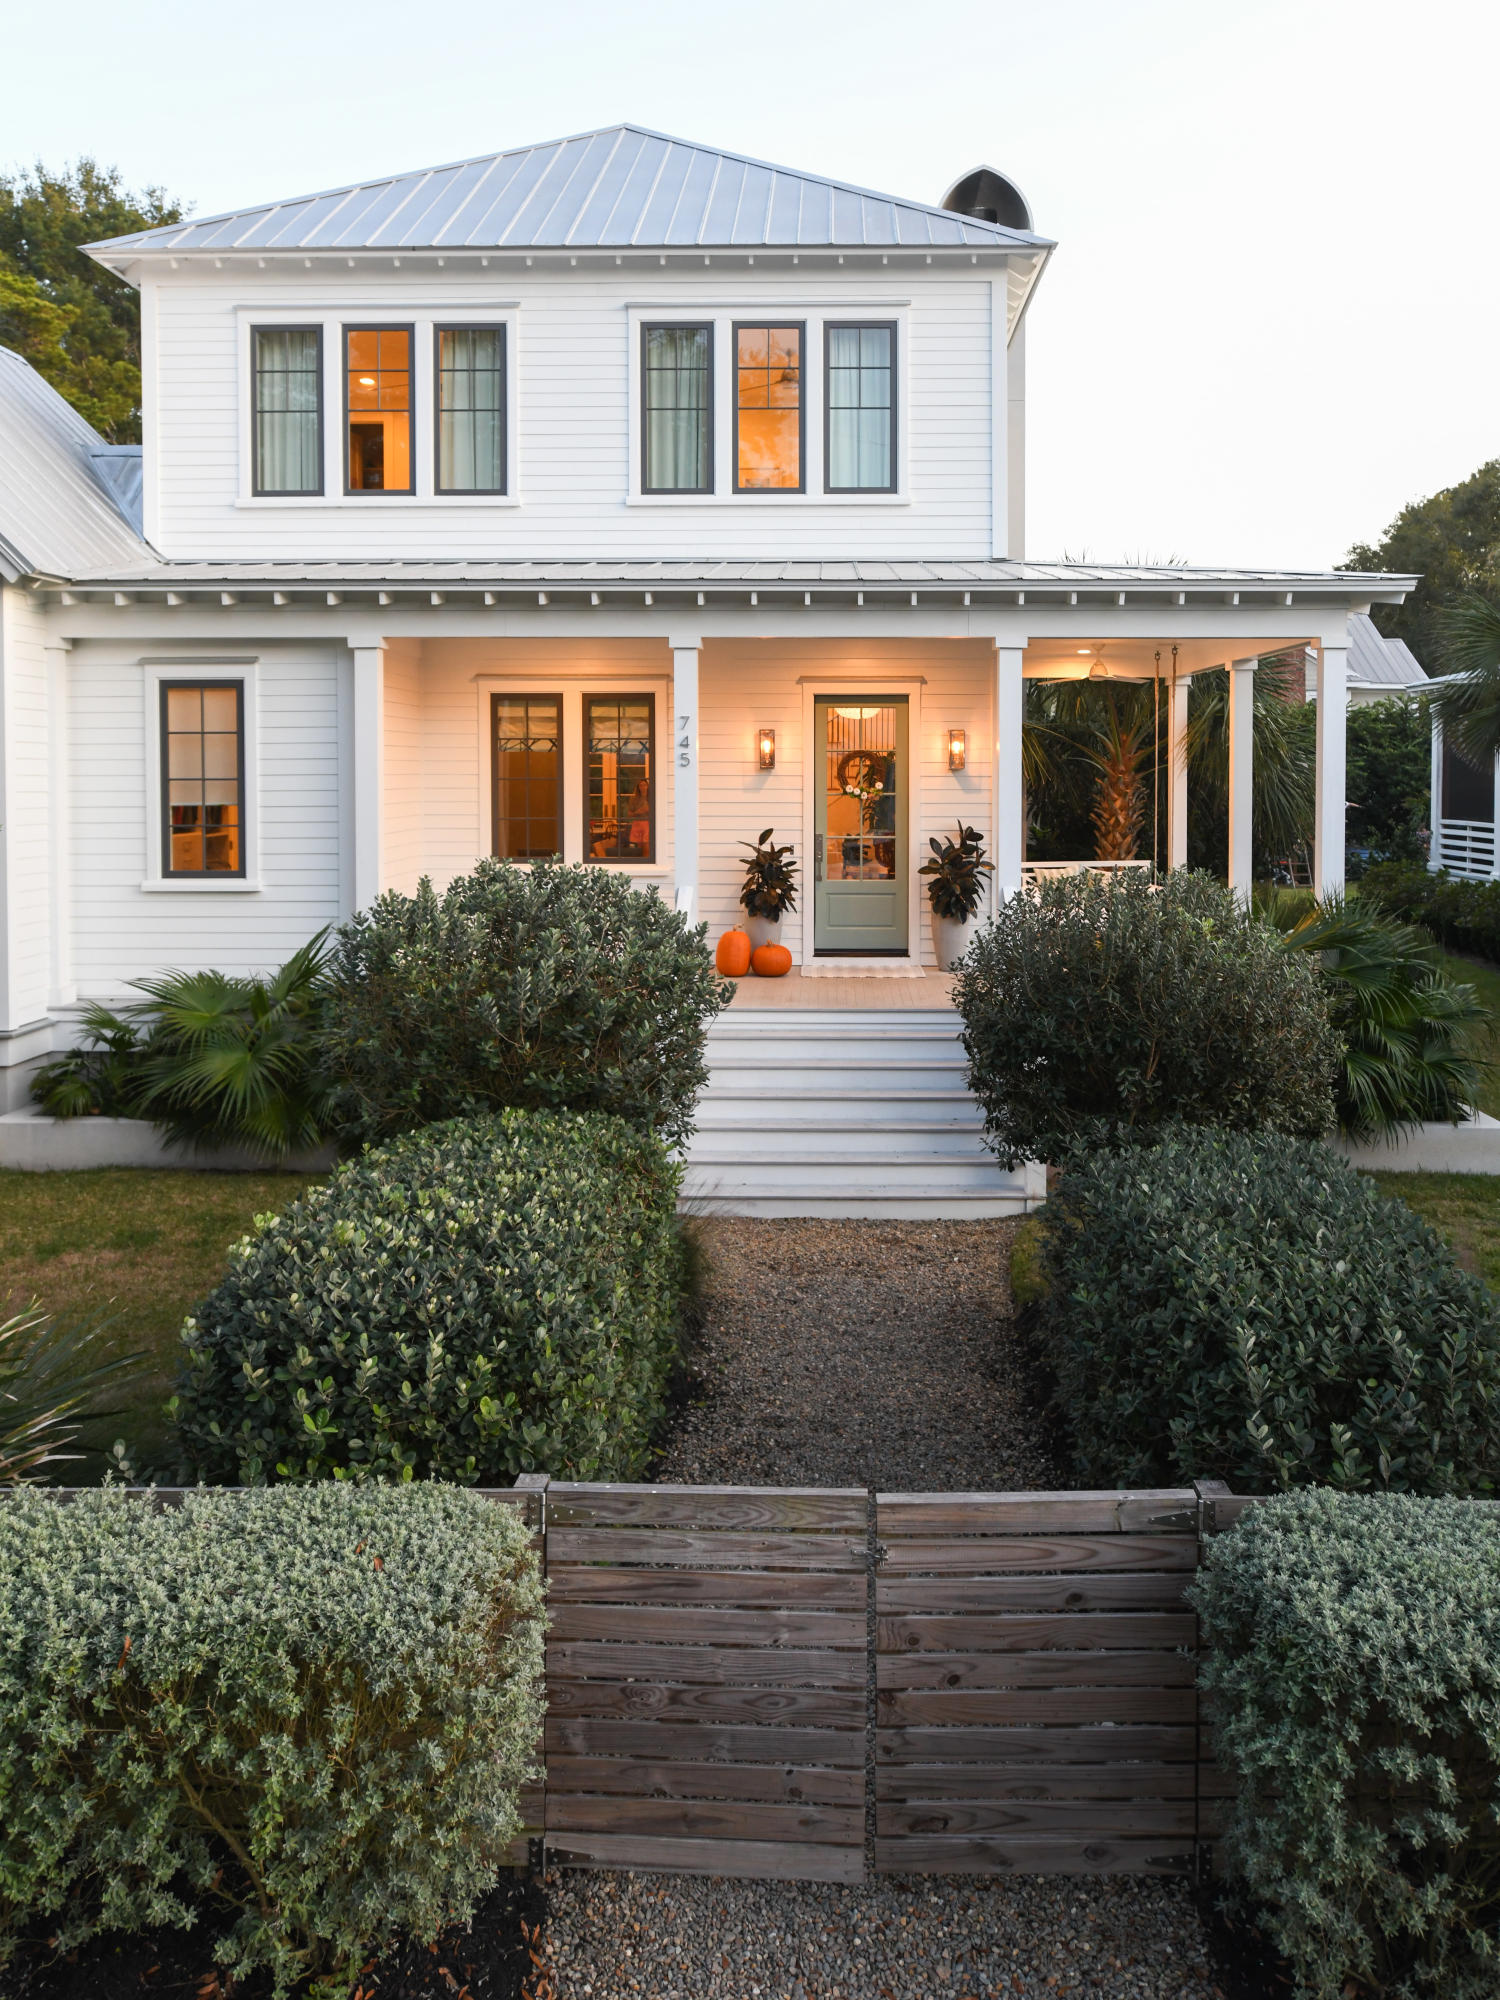 Old Mt Pleasant Homes For Sale - 745 Winthrop, Mount Pleasant, SC - 3